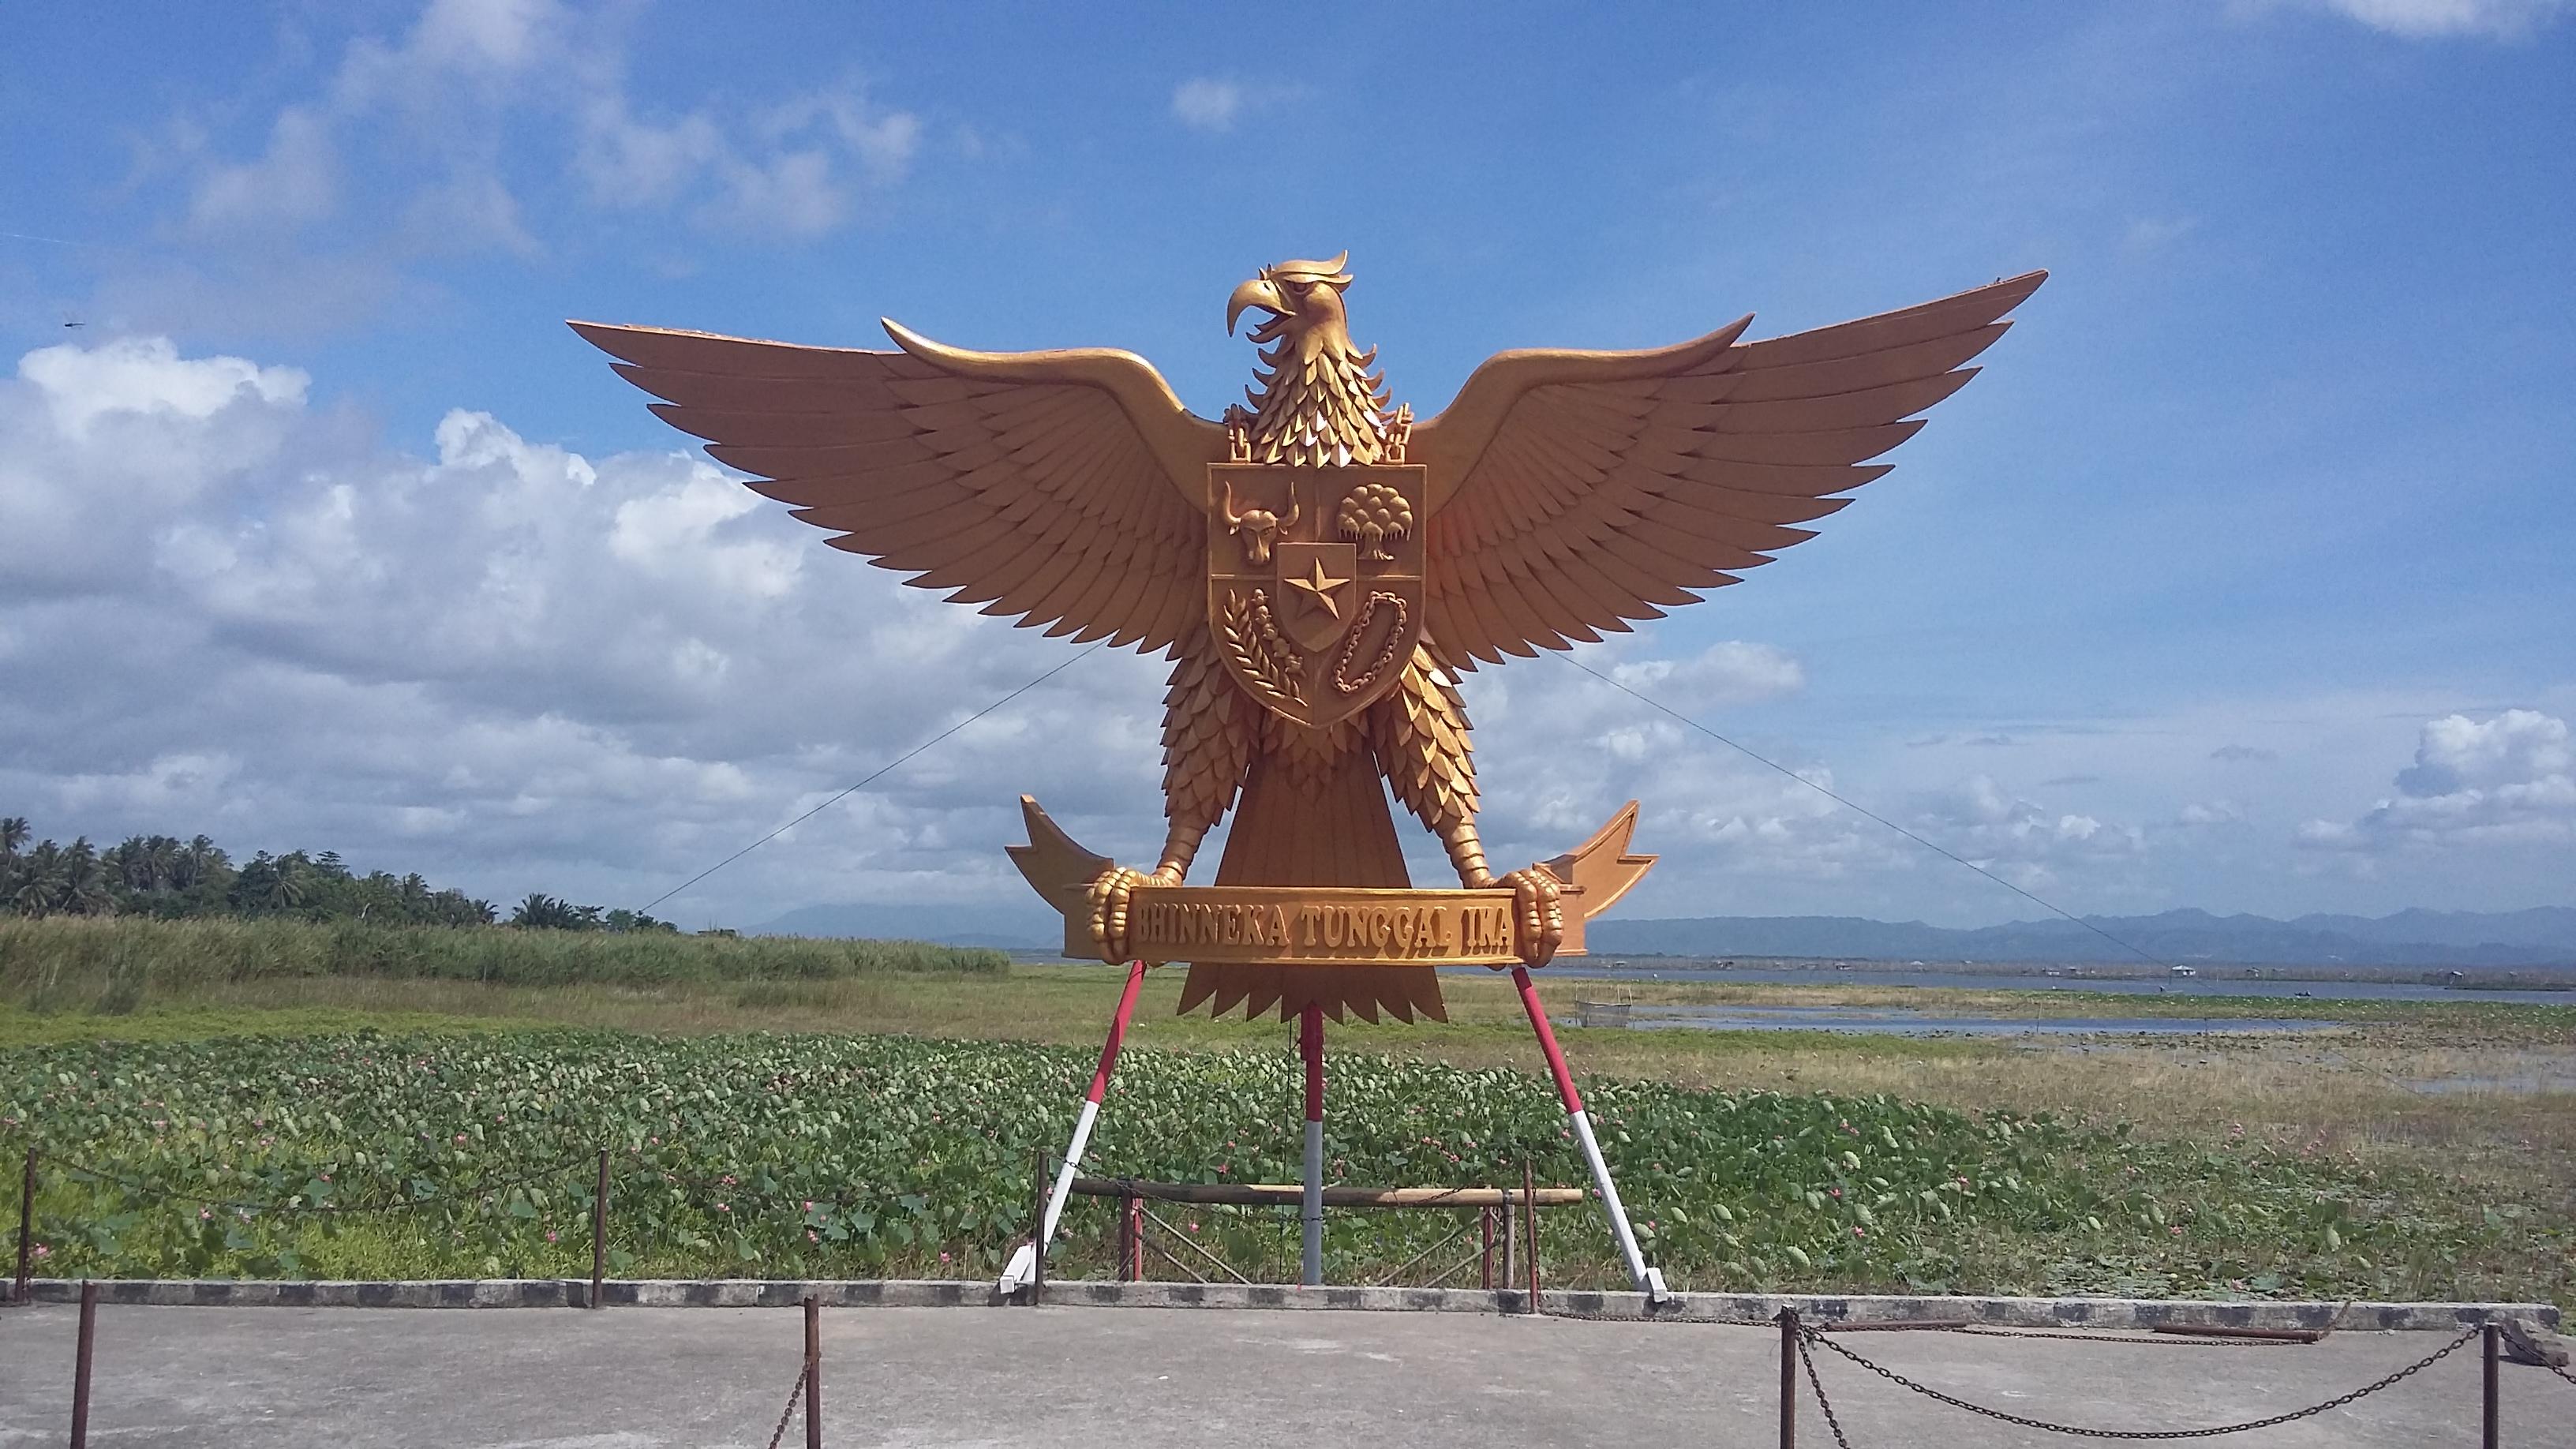 Gorontalo Wikipedia Bahasa Indonesia Ensiklopedia Bebas Patung Garuda Museum Pendaratan